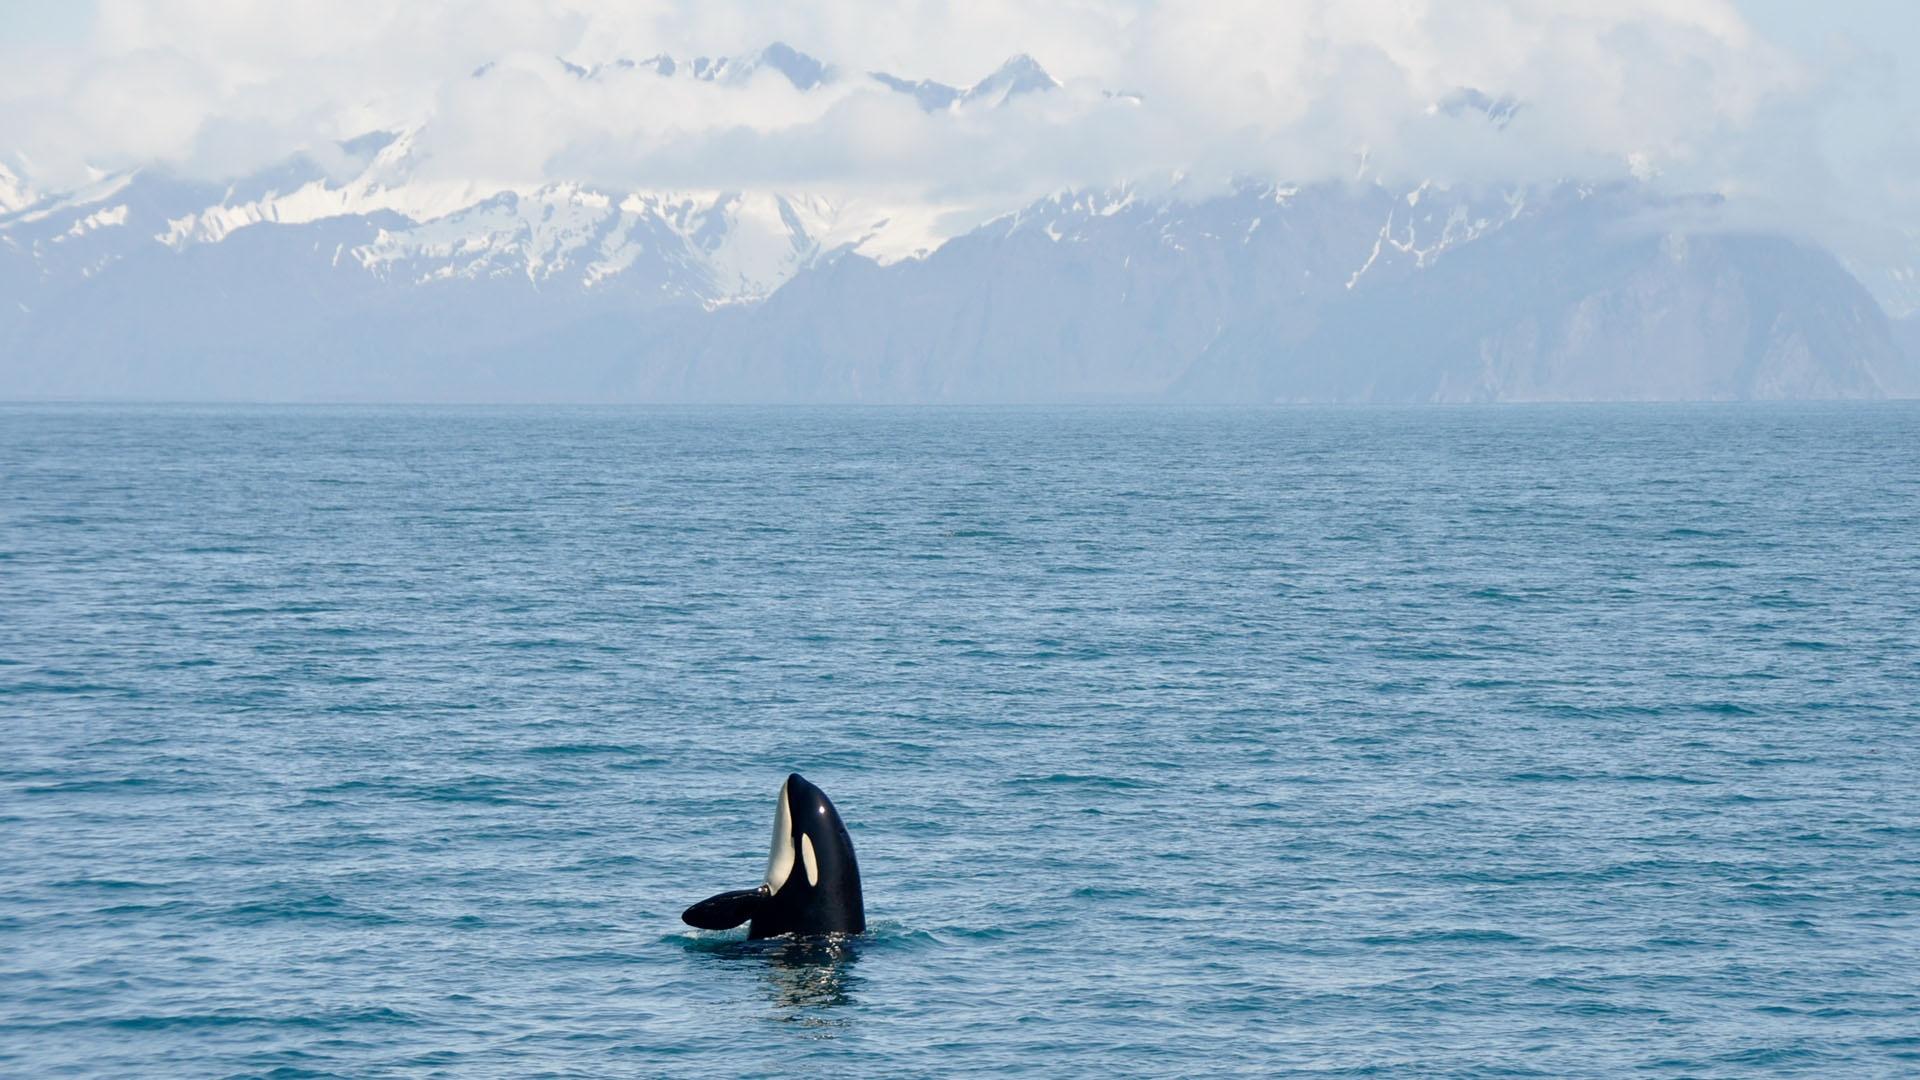 Meet the Orca Team of Wild Alaska Live